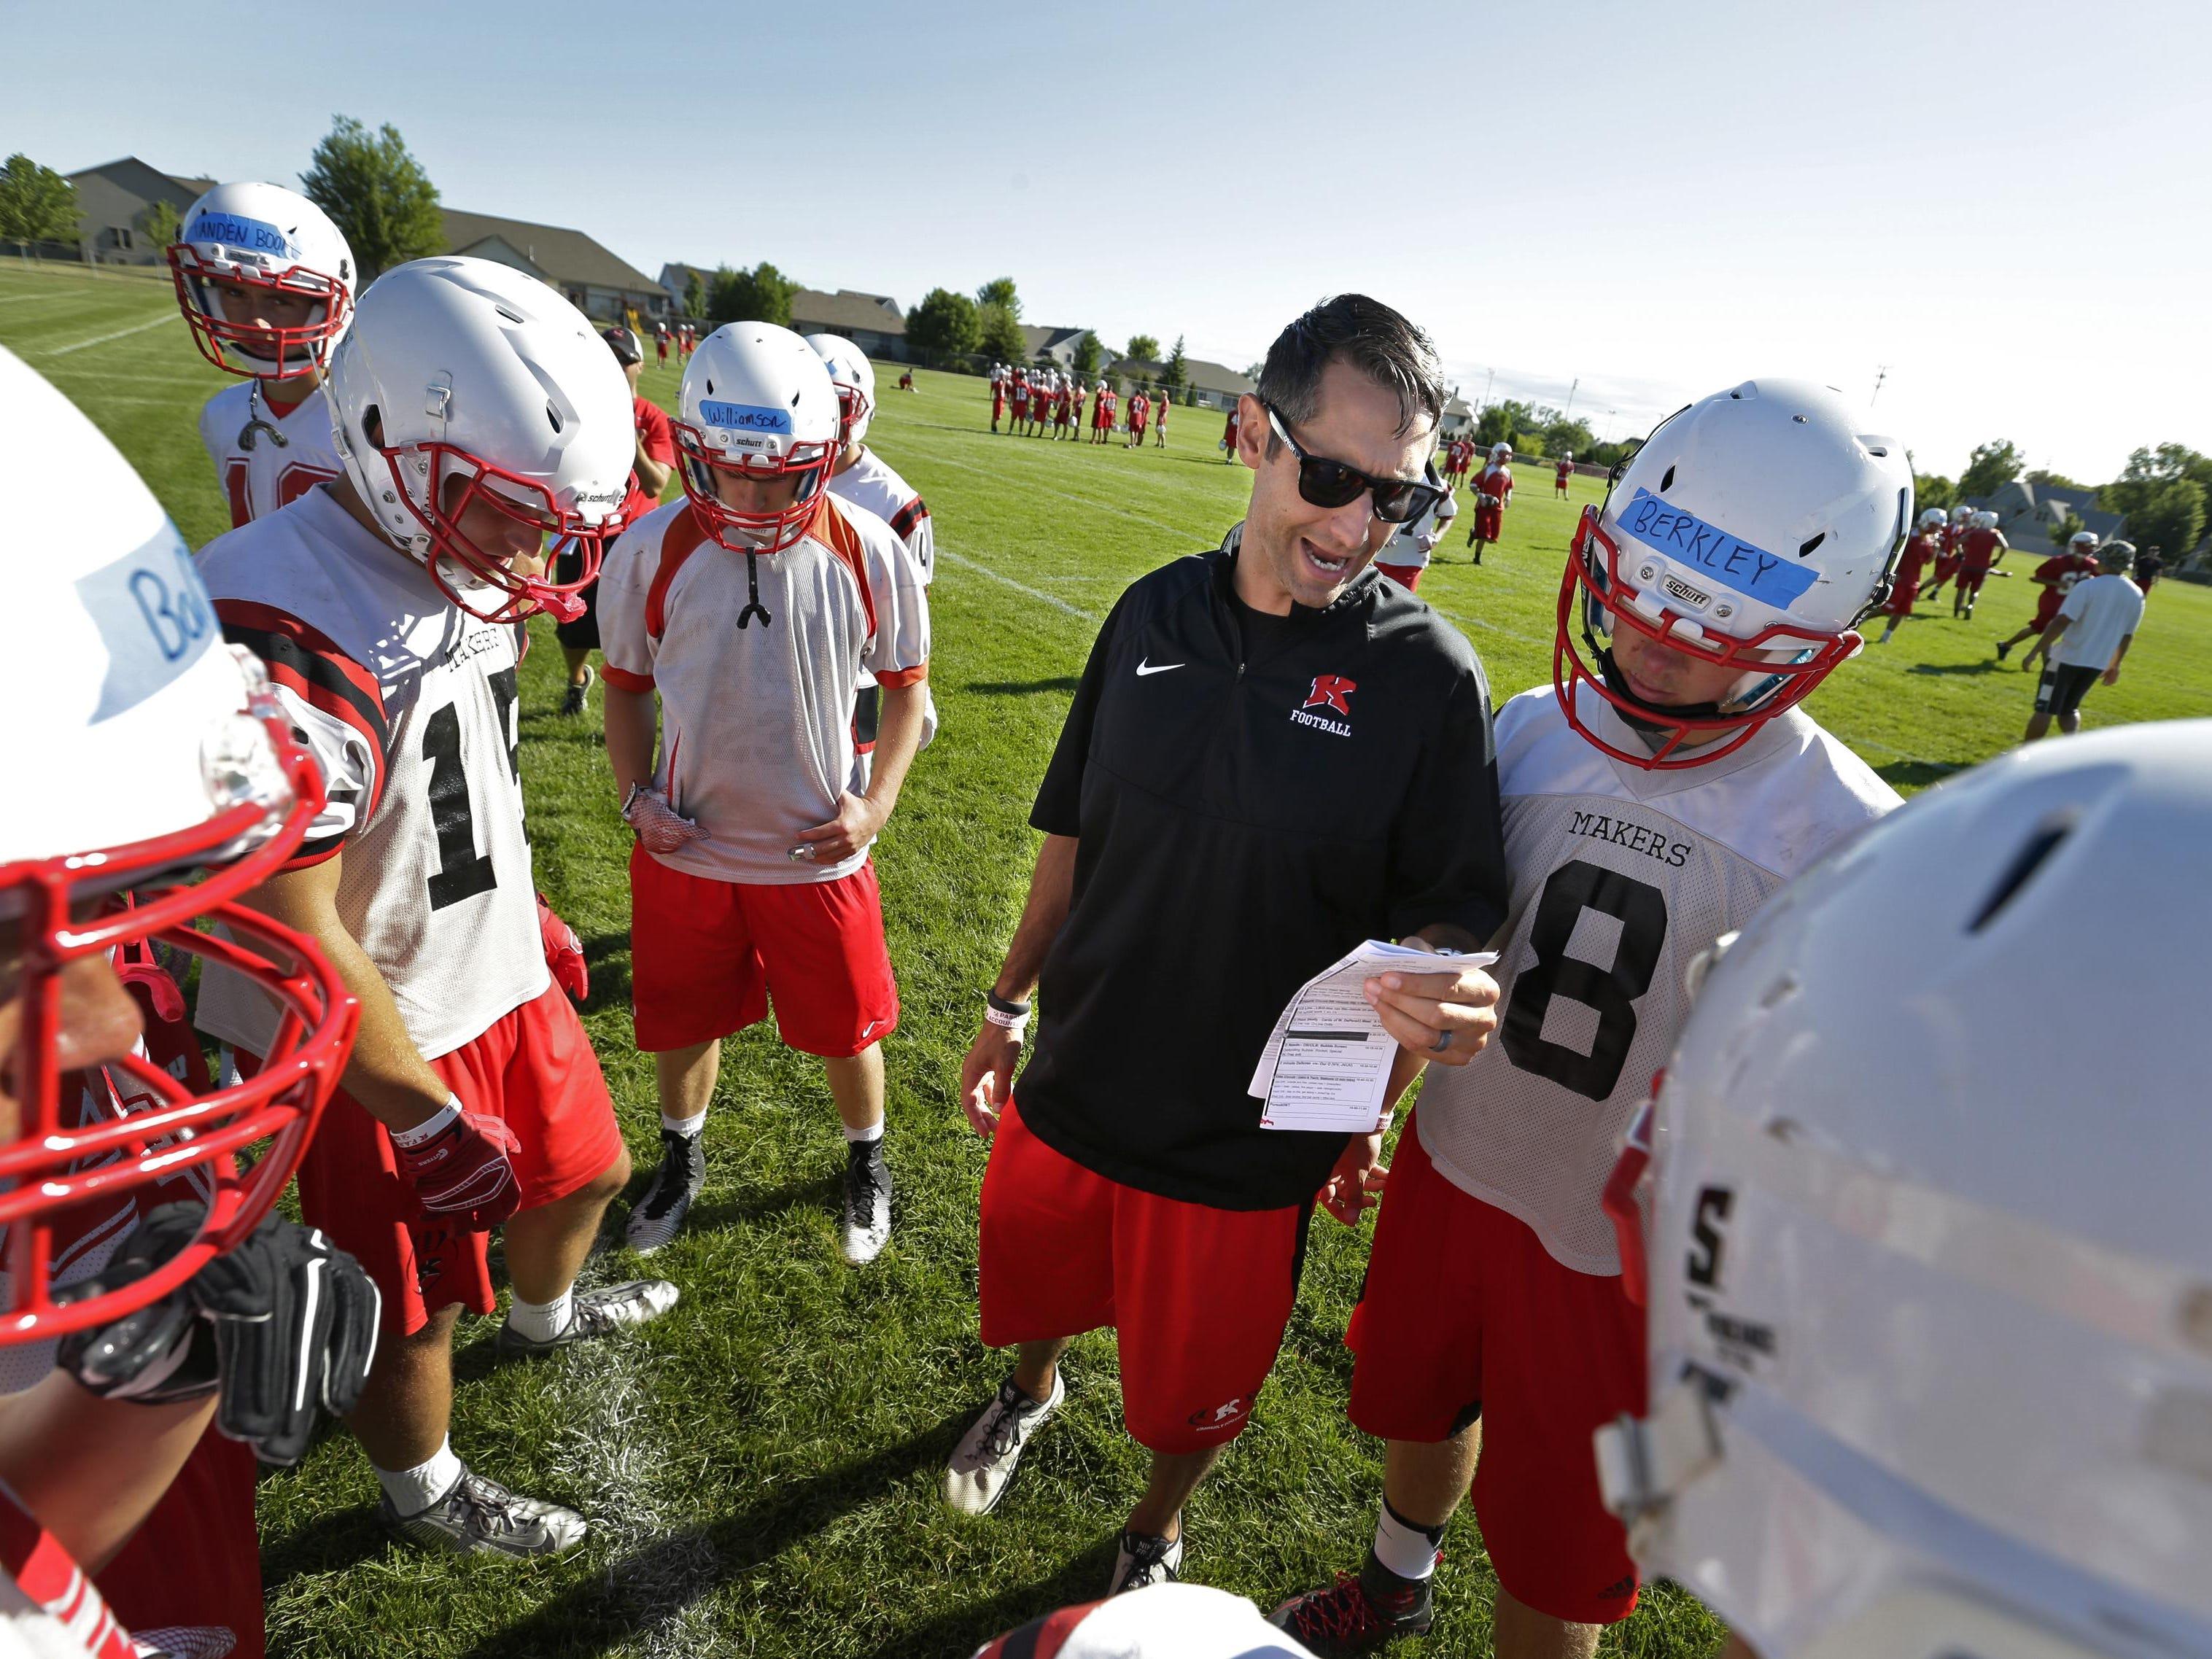 Kimberly head coach Steve Jones calls a play for quarterback Ethan Berkley (8) during the first football practice of the season Tuesday.